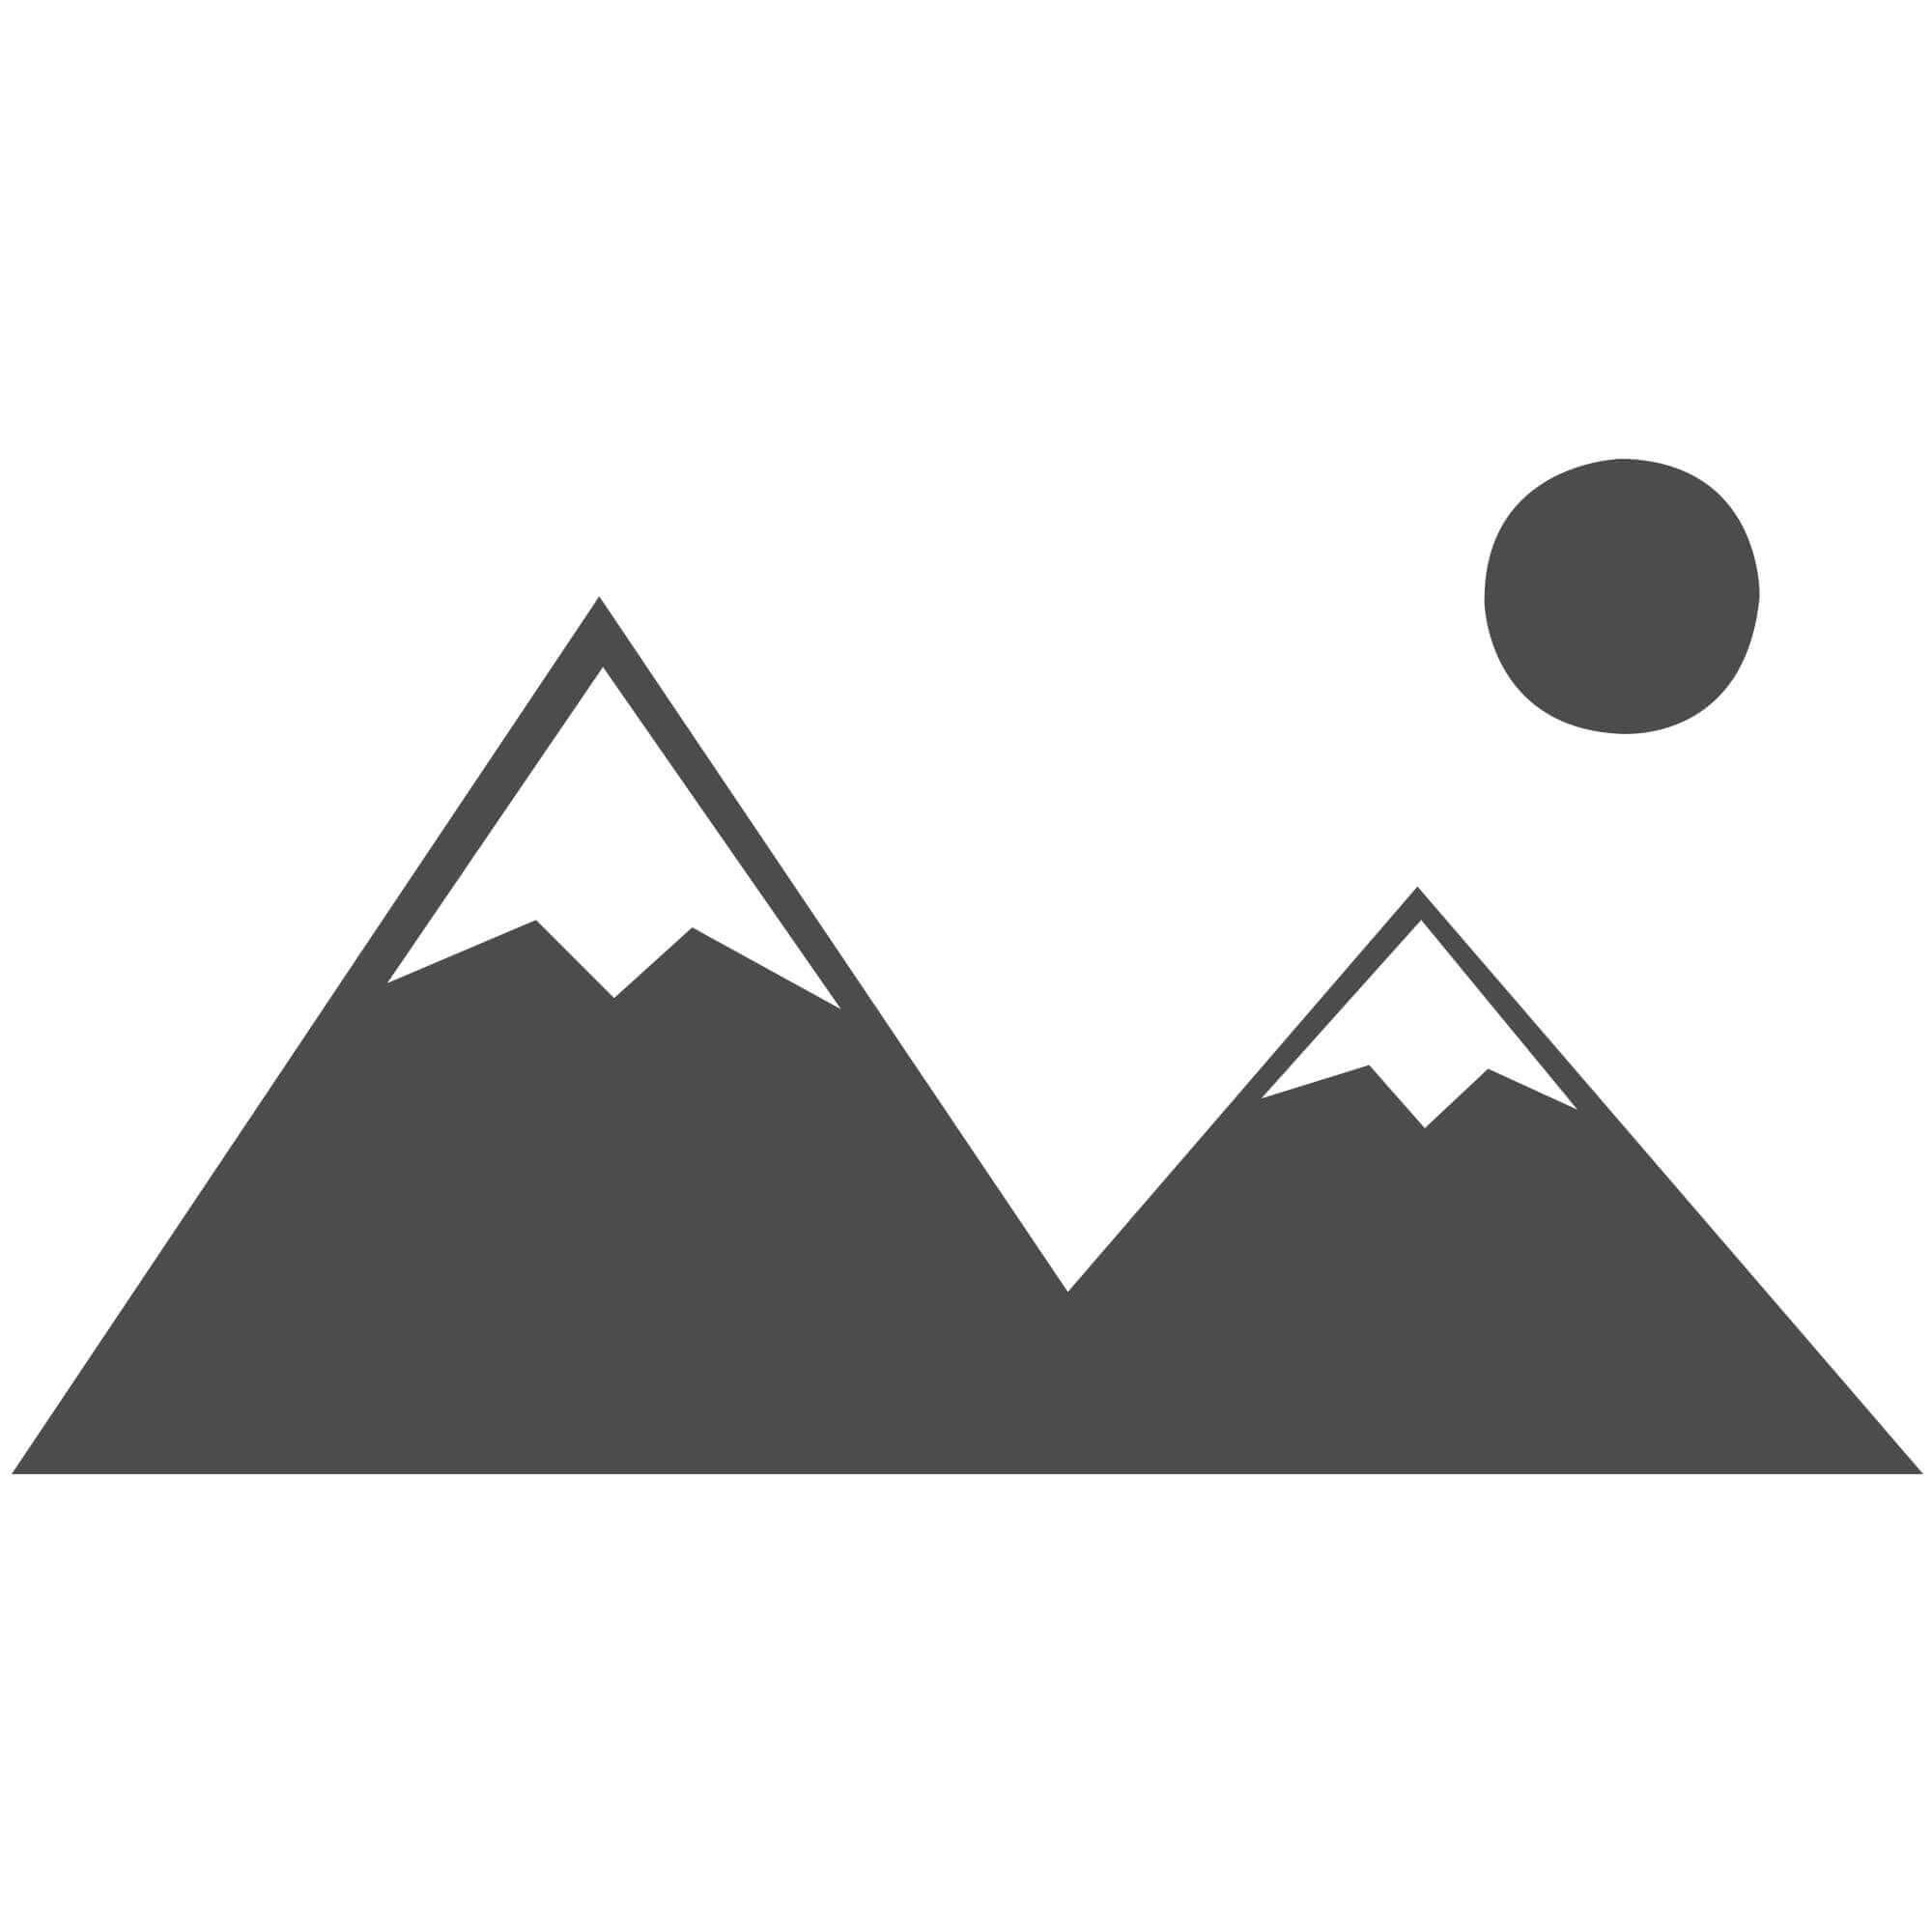 "New Vintage Yellow 8084 Rug by Louis de Poortere-80 x 150 cm (2'8"" x 5')"